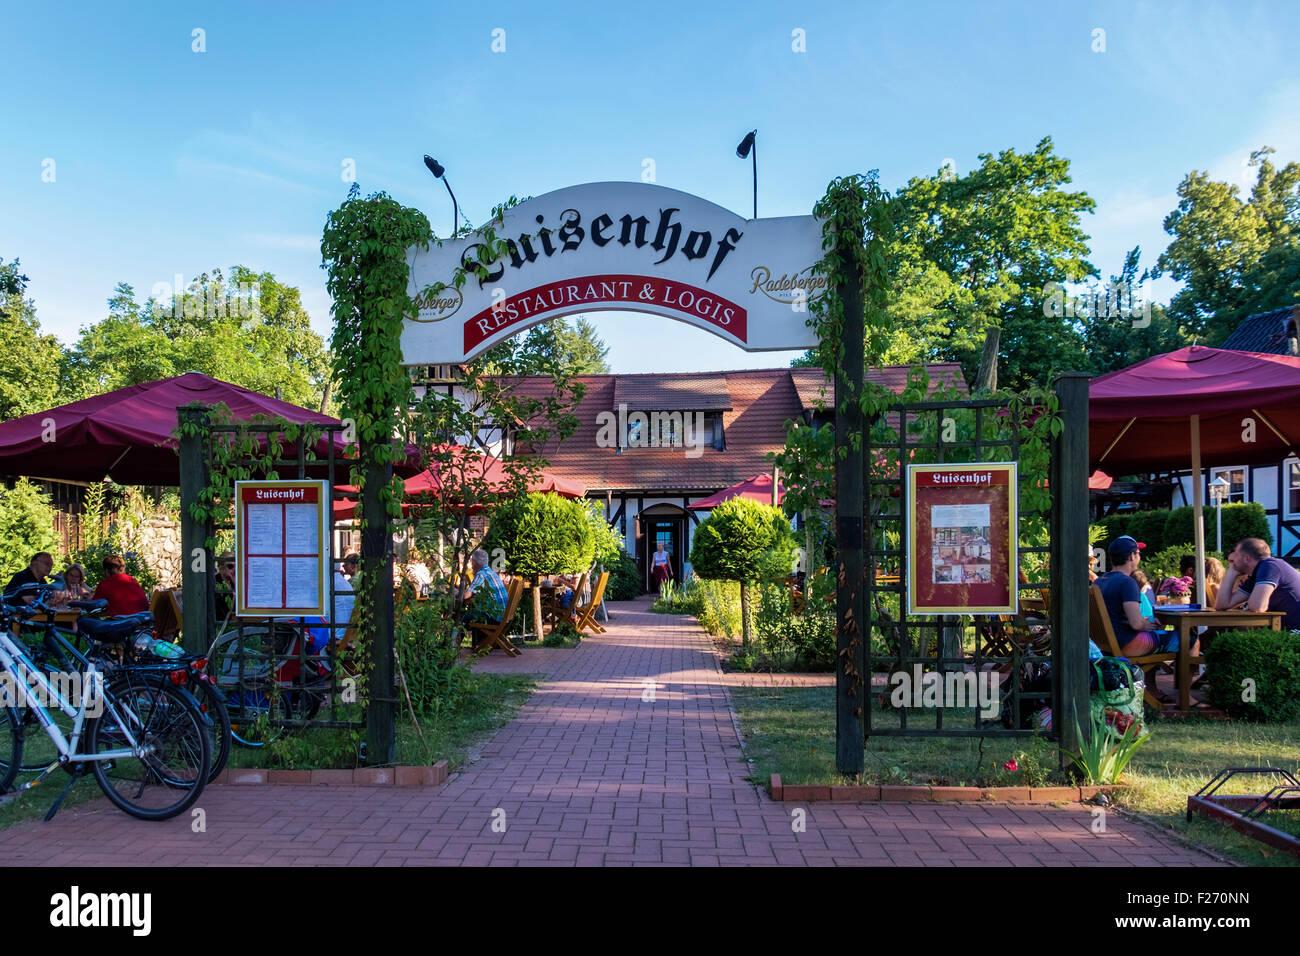 Luisenhof restaurant and beer garden with alfresco dining at Großer Stechlinsee, Lake Stechlin resort, Brandenburg, - Stock Image